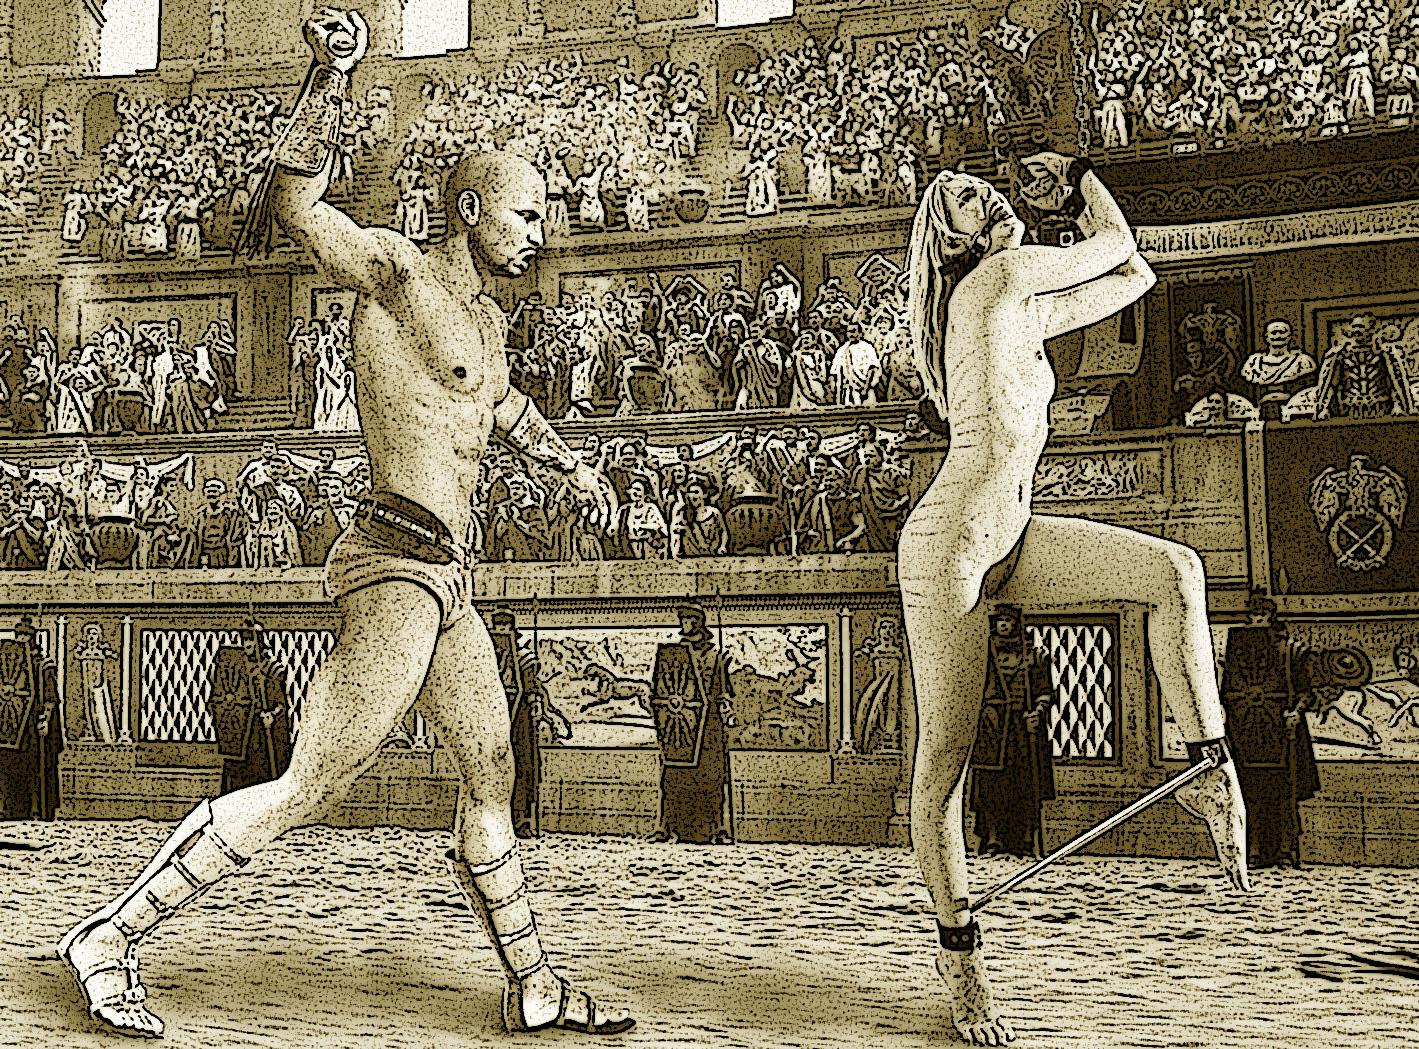 Roman bdsm executions xxx images